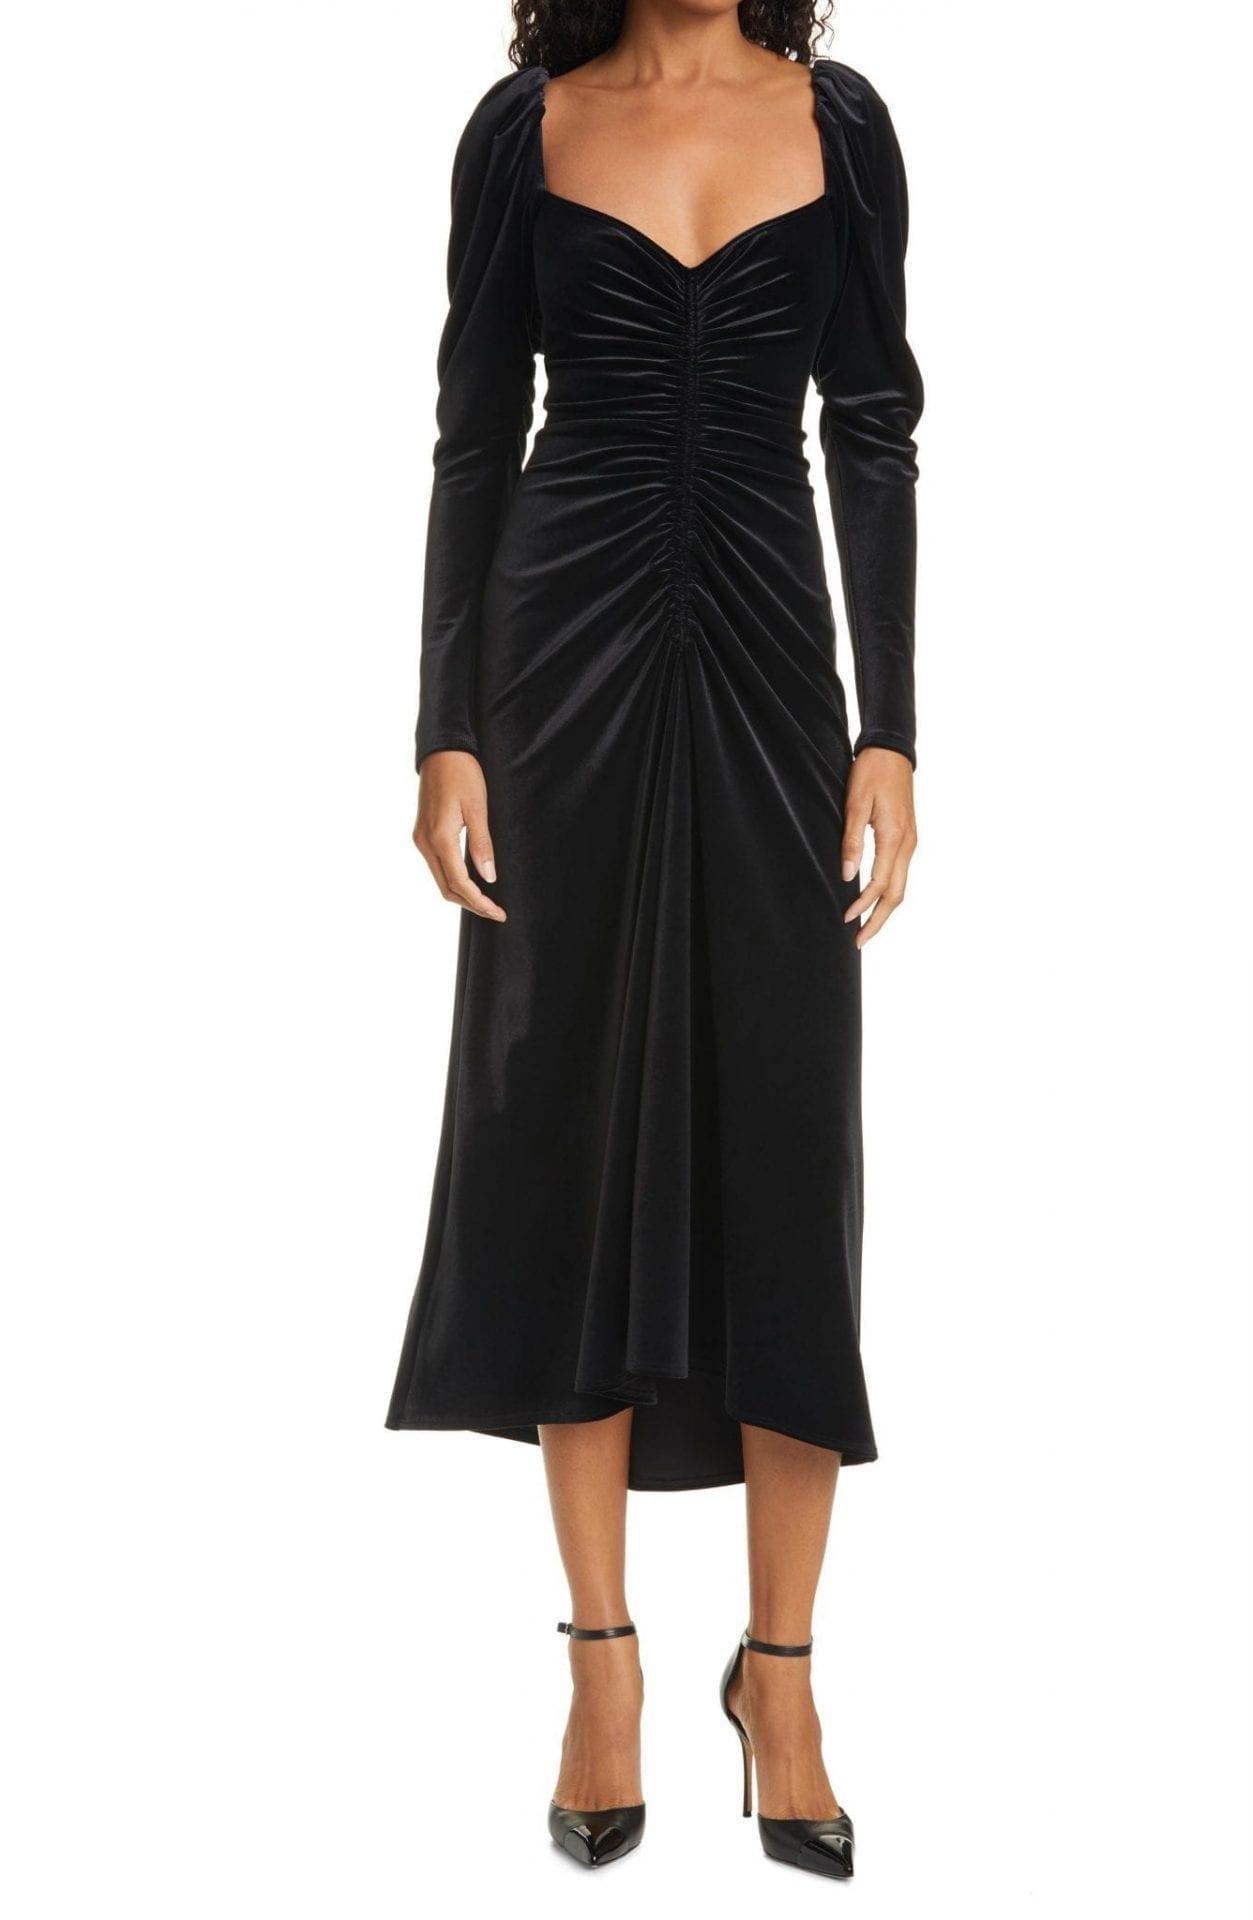 A.L.C. Chamberlin Long Sleeve Dress